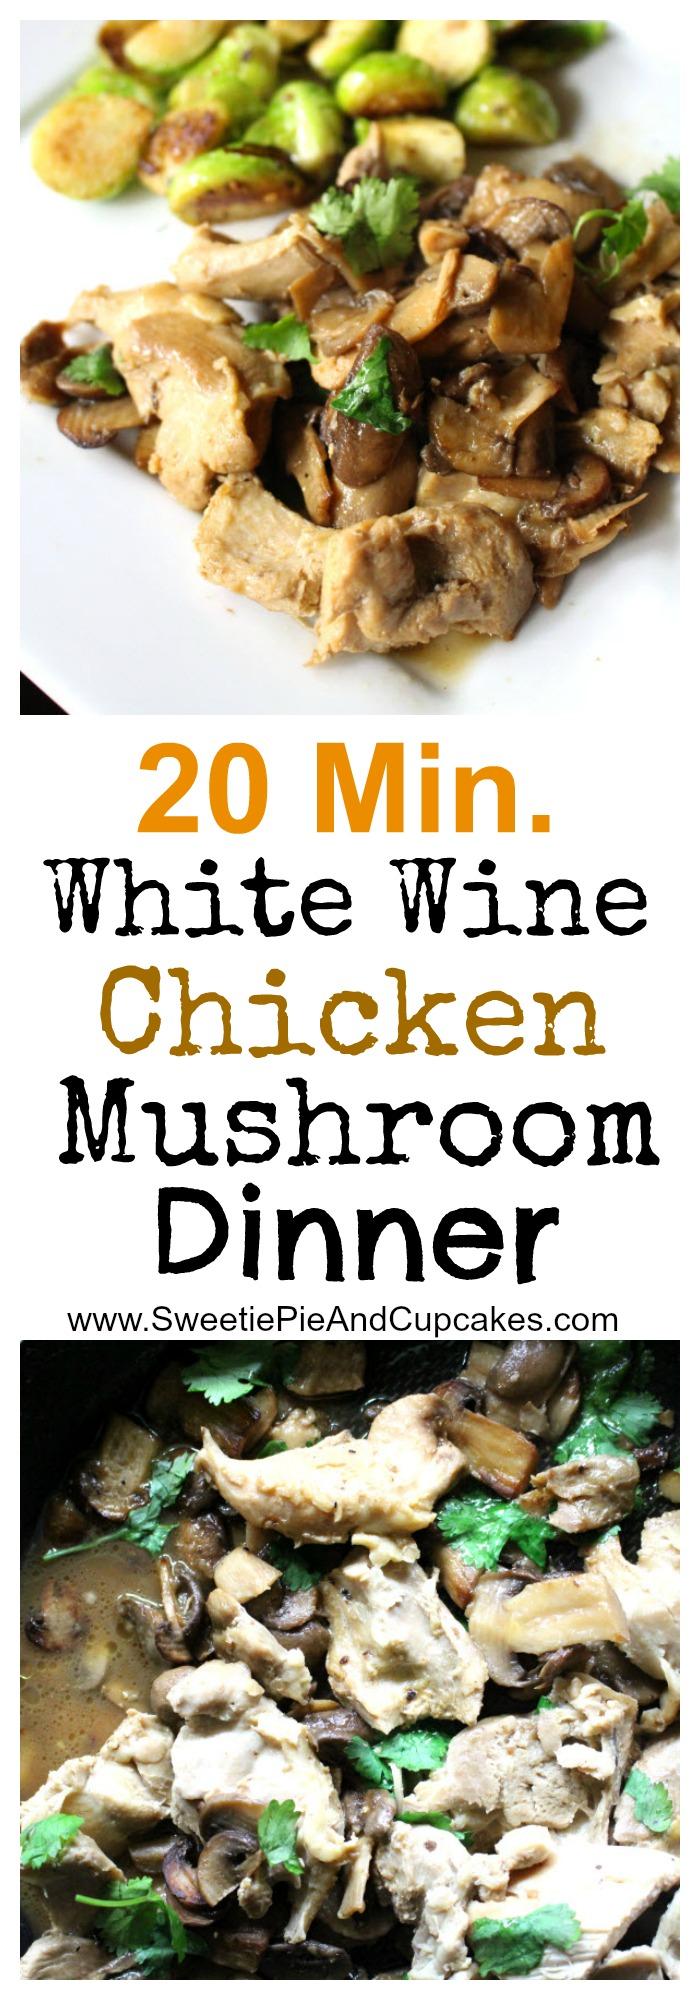 White Wine Chicken Mushroom Dinner